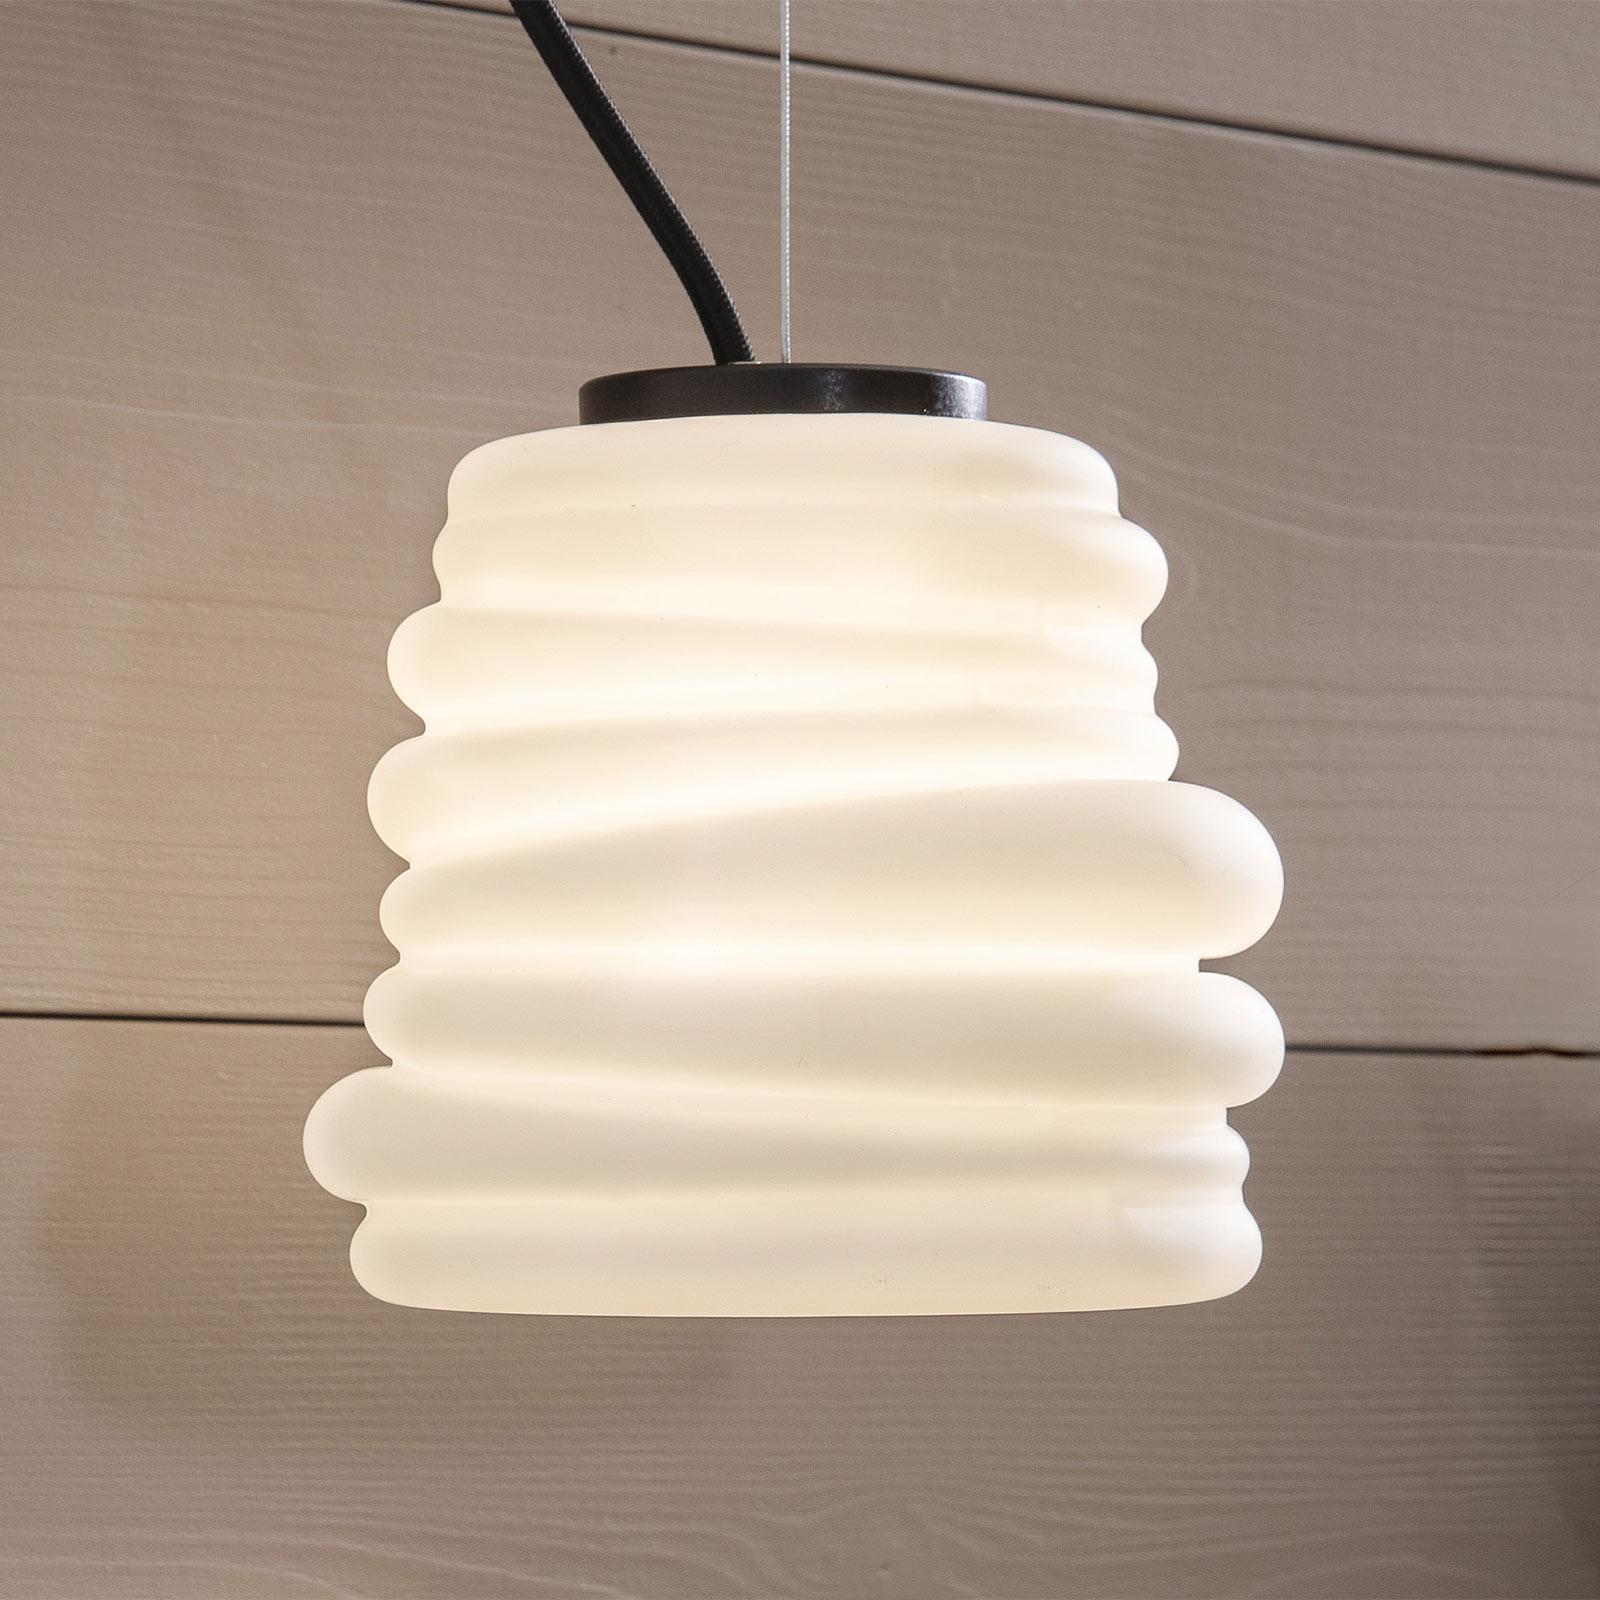 Karman Bibendum lampa wisząca LED, Ø 15 cm, biała